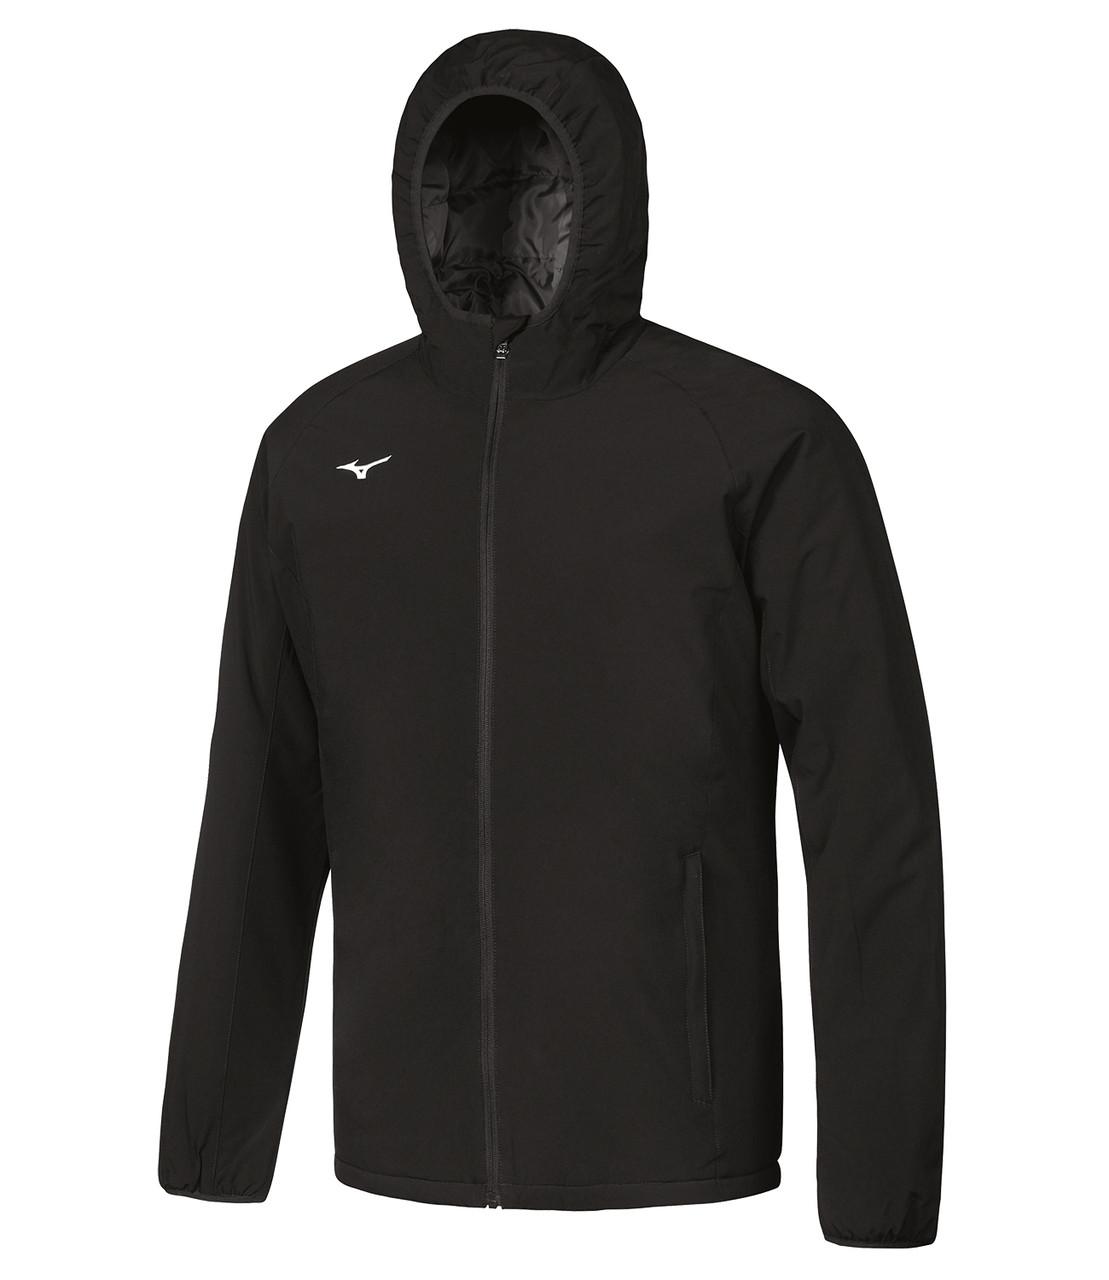 Куртка для бега Mizuno Padded Jacket 32EE7500-09